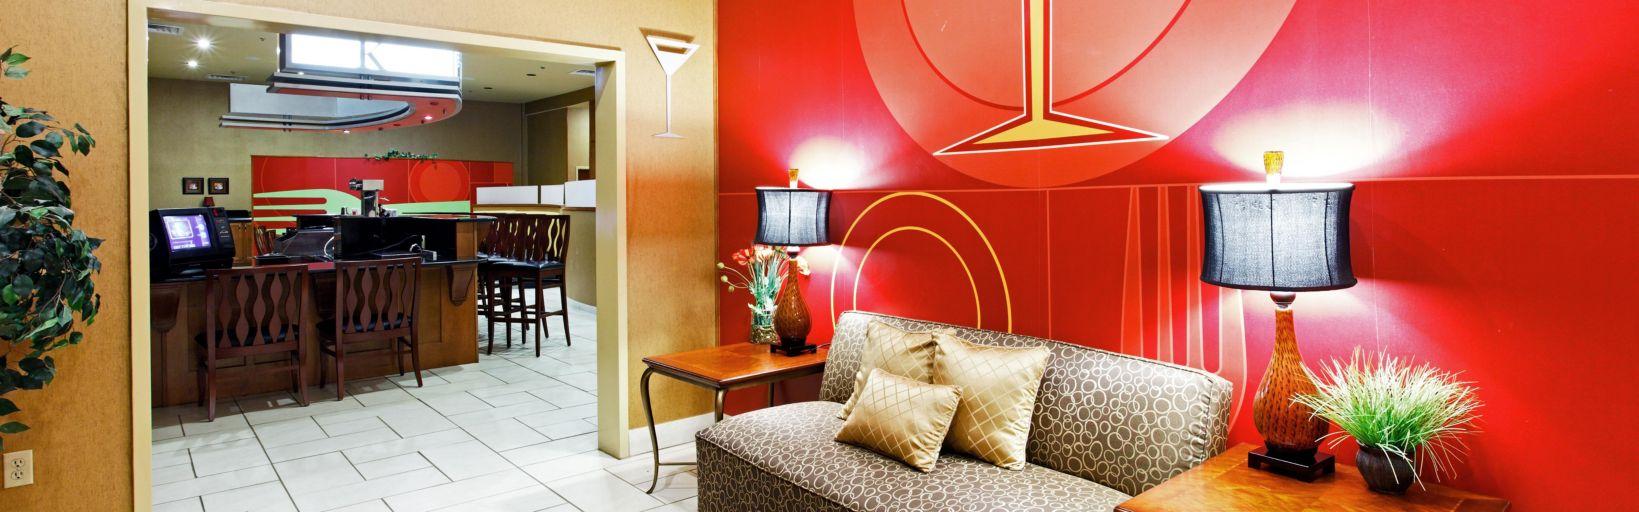 Hotel Lobby 8 Miles From Sardis Lake